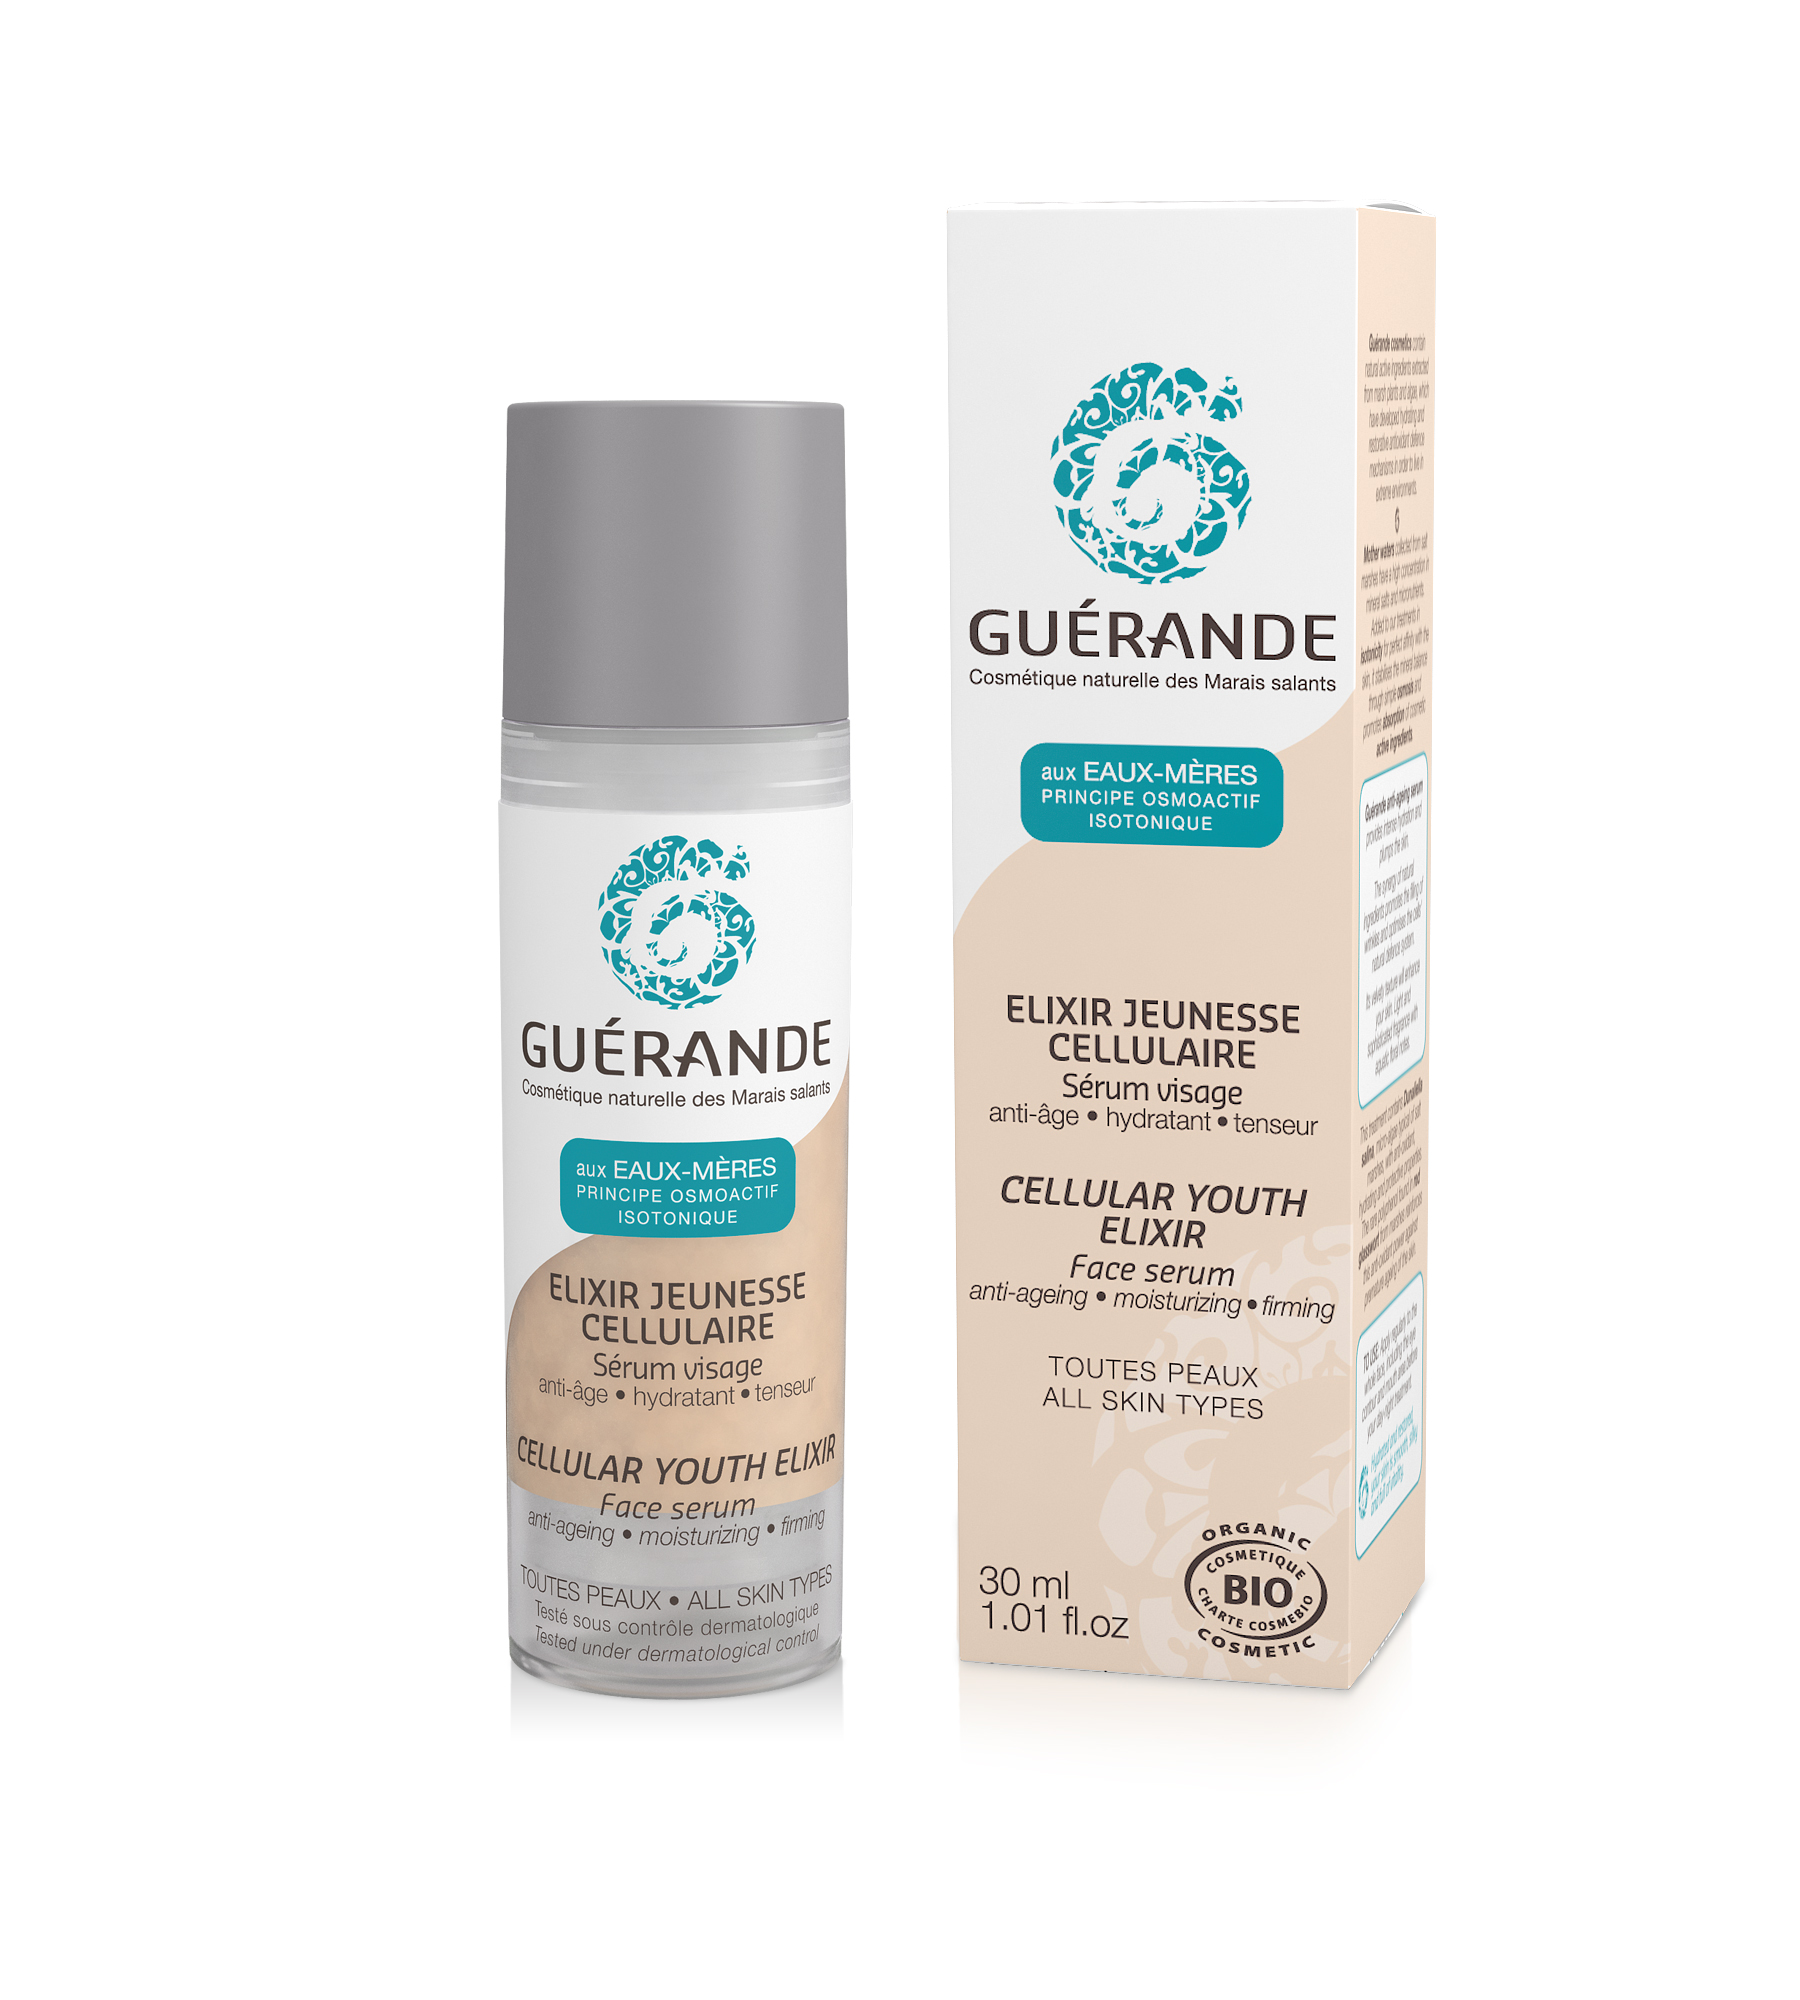 guerande-serum-elixir